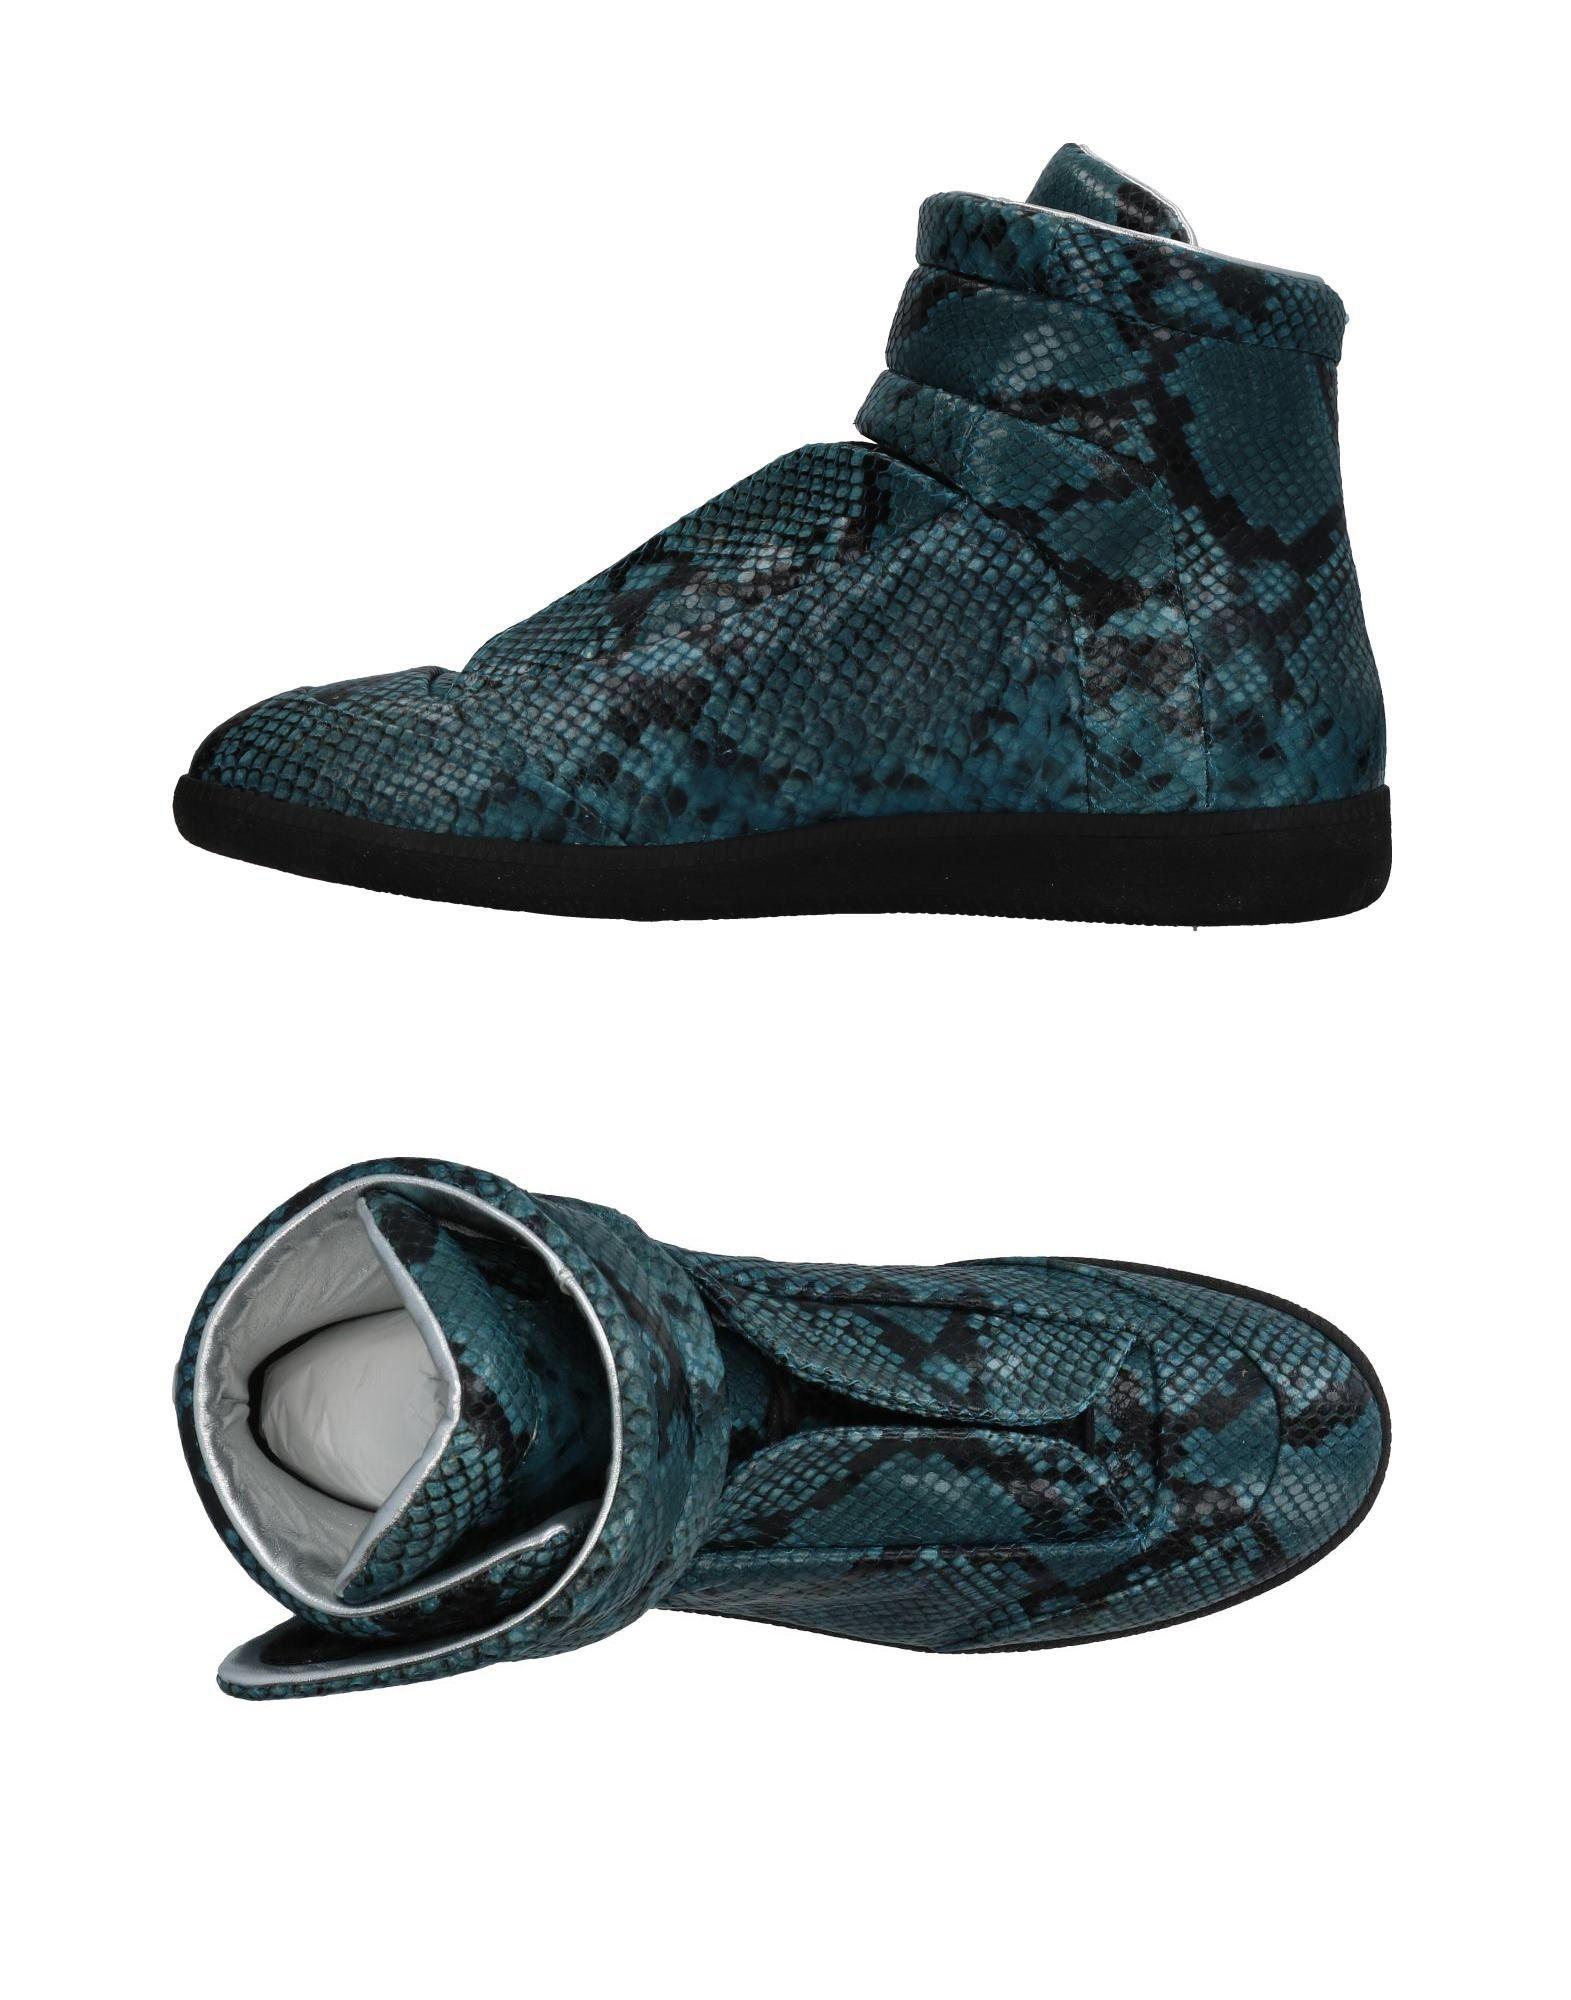 Maison Margiela Sneakers Herren  11341630BT Gute Qualität beliebte Schuhe